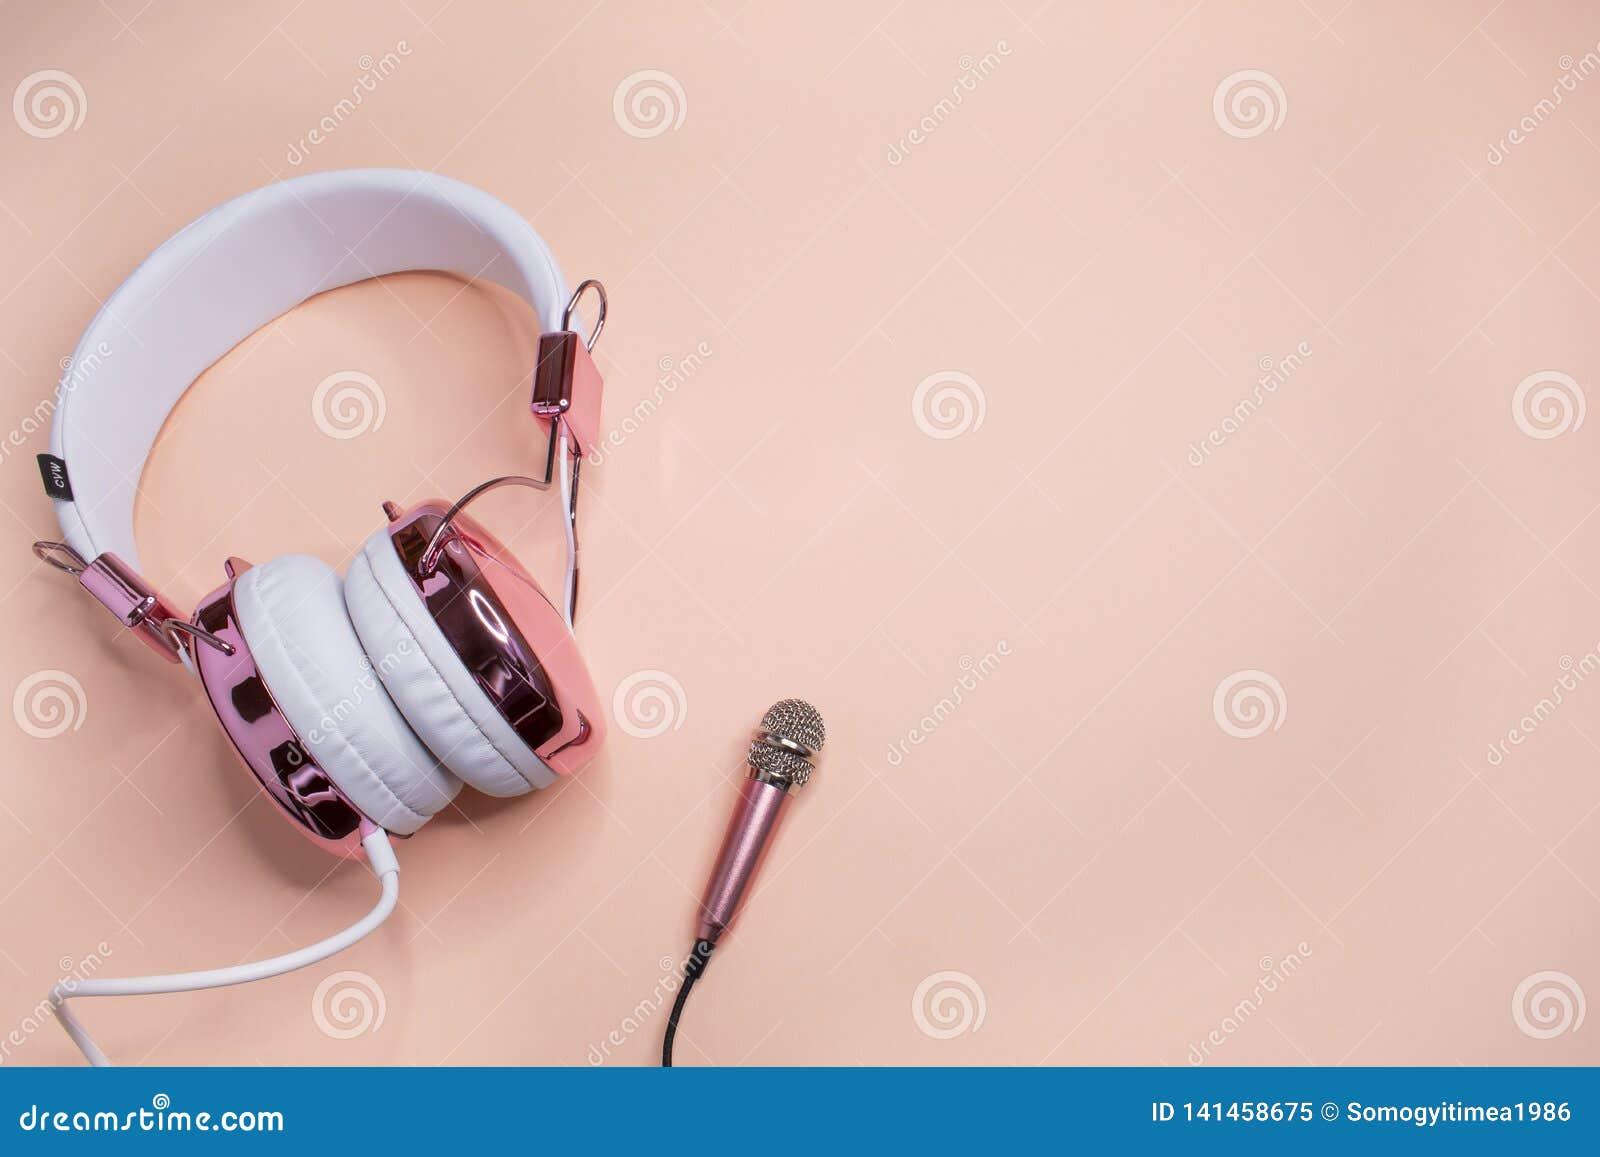 Musikhintergrund mit rosa Kopfhörern und Mikrofon